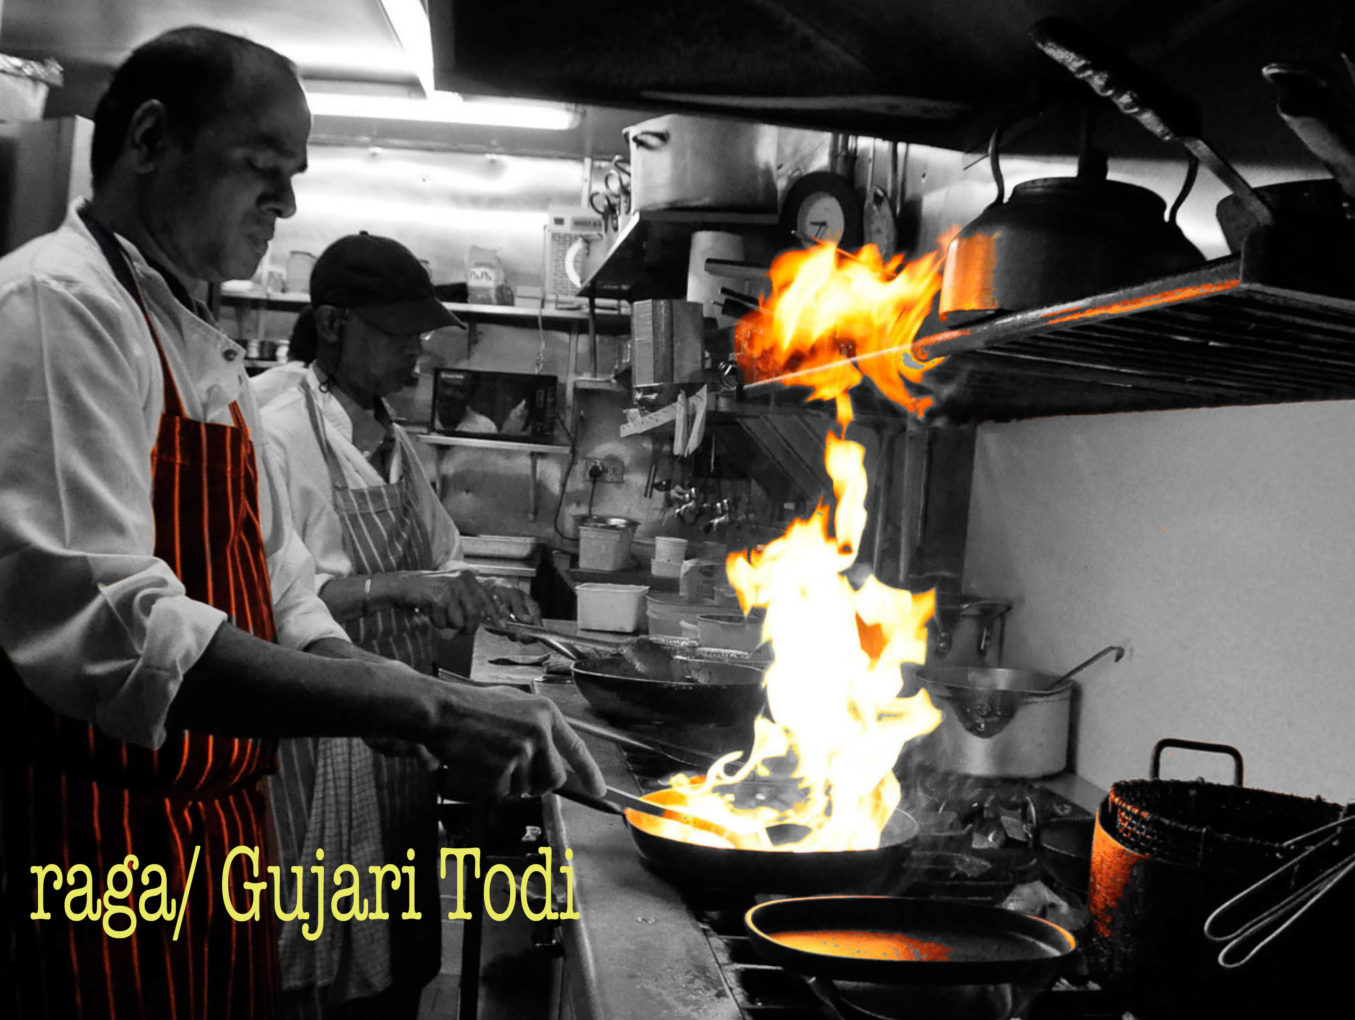 Raga Gujari Todi by Jonathan Mayer